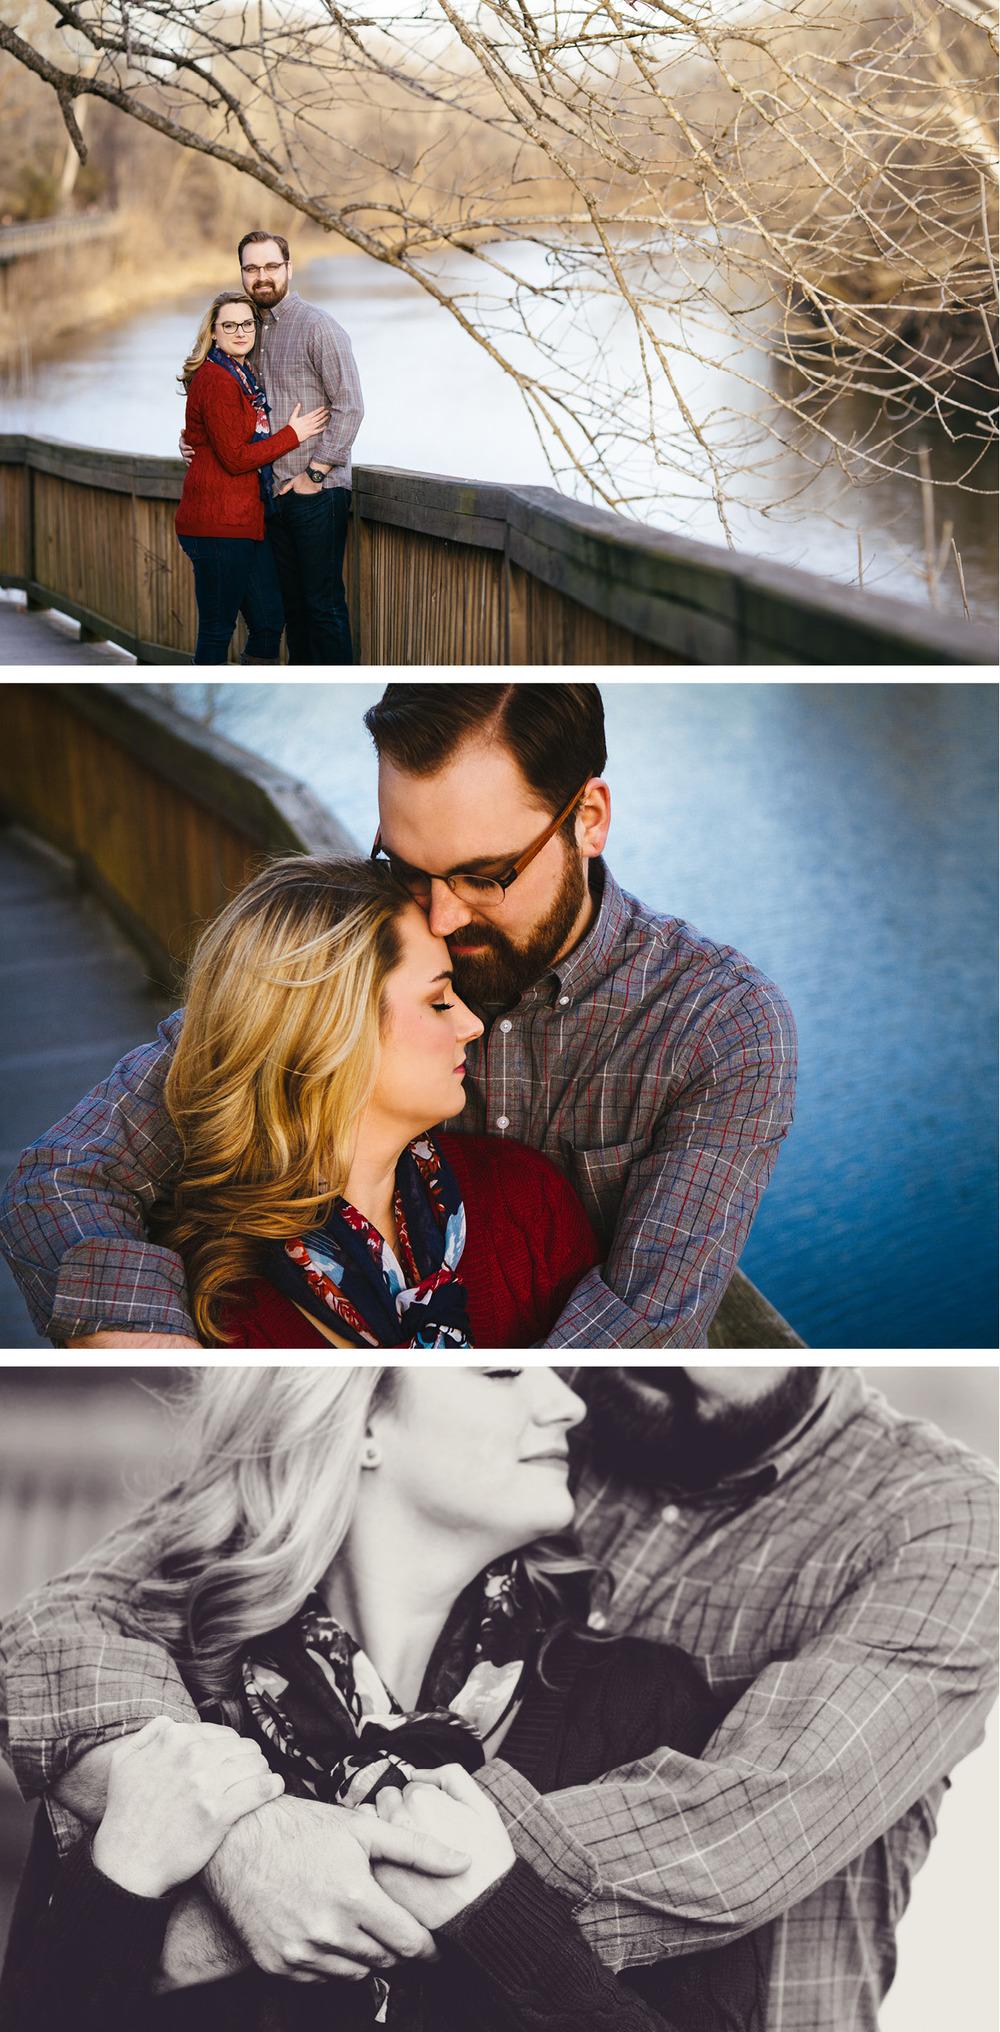 CK-Photo-Nashville-Engagement-Photographer-st-6.jpg